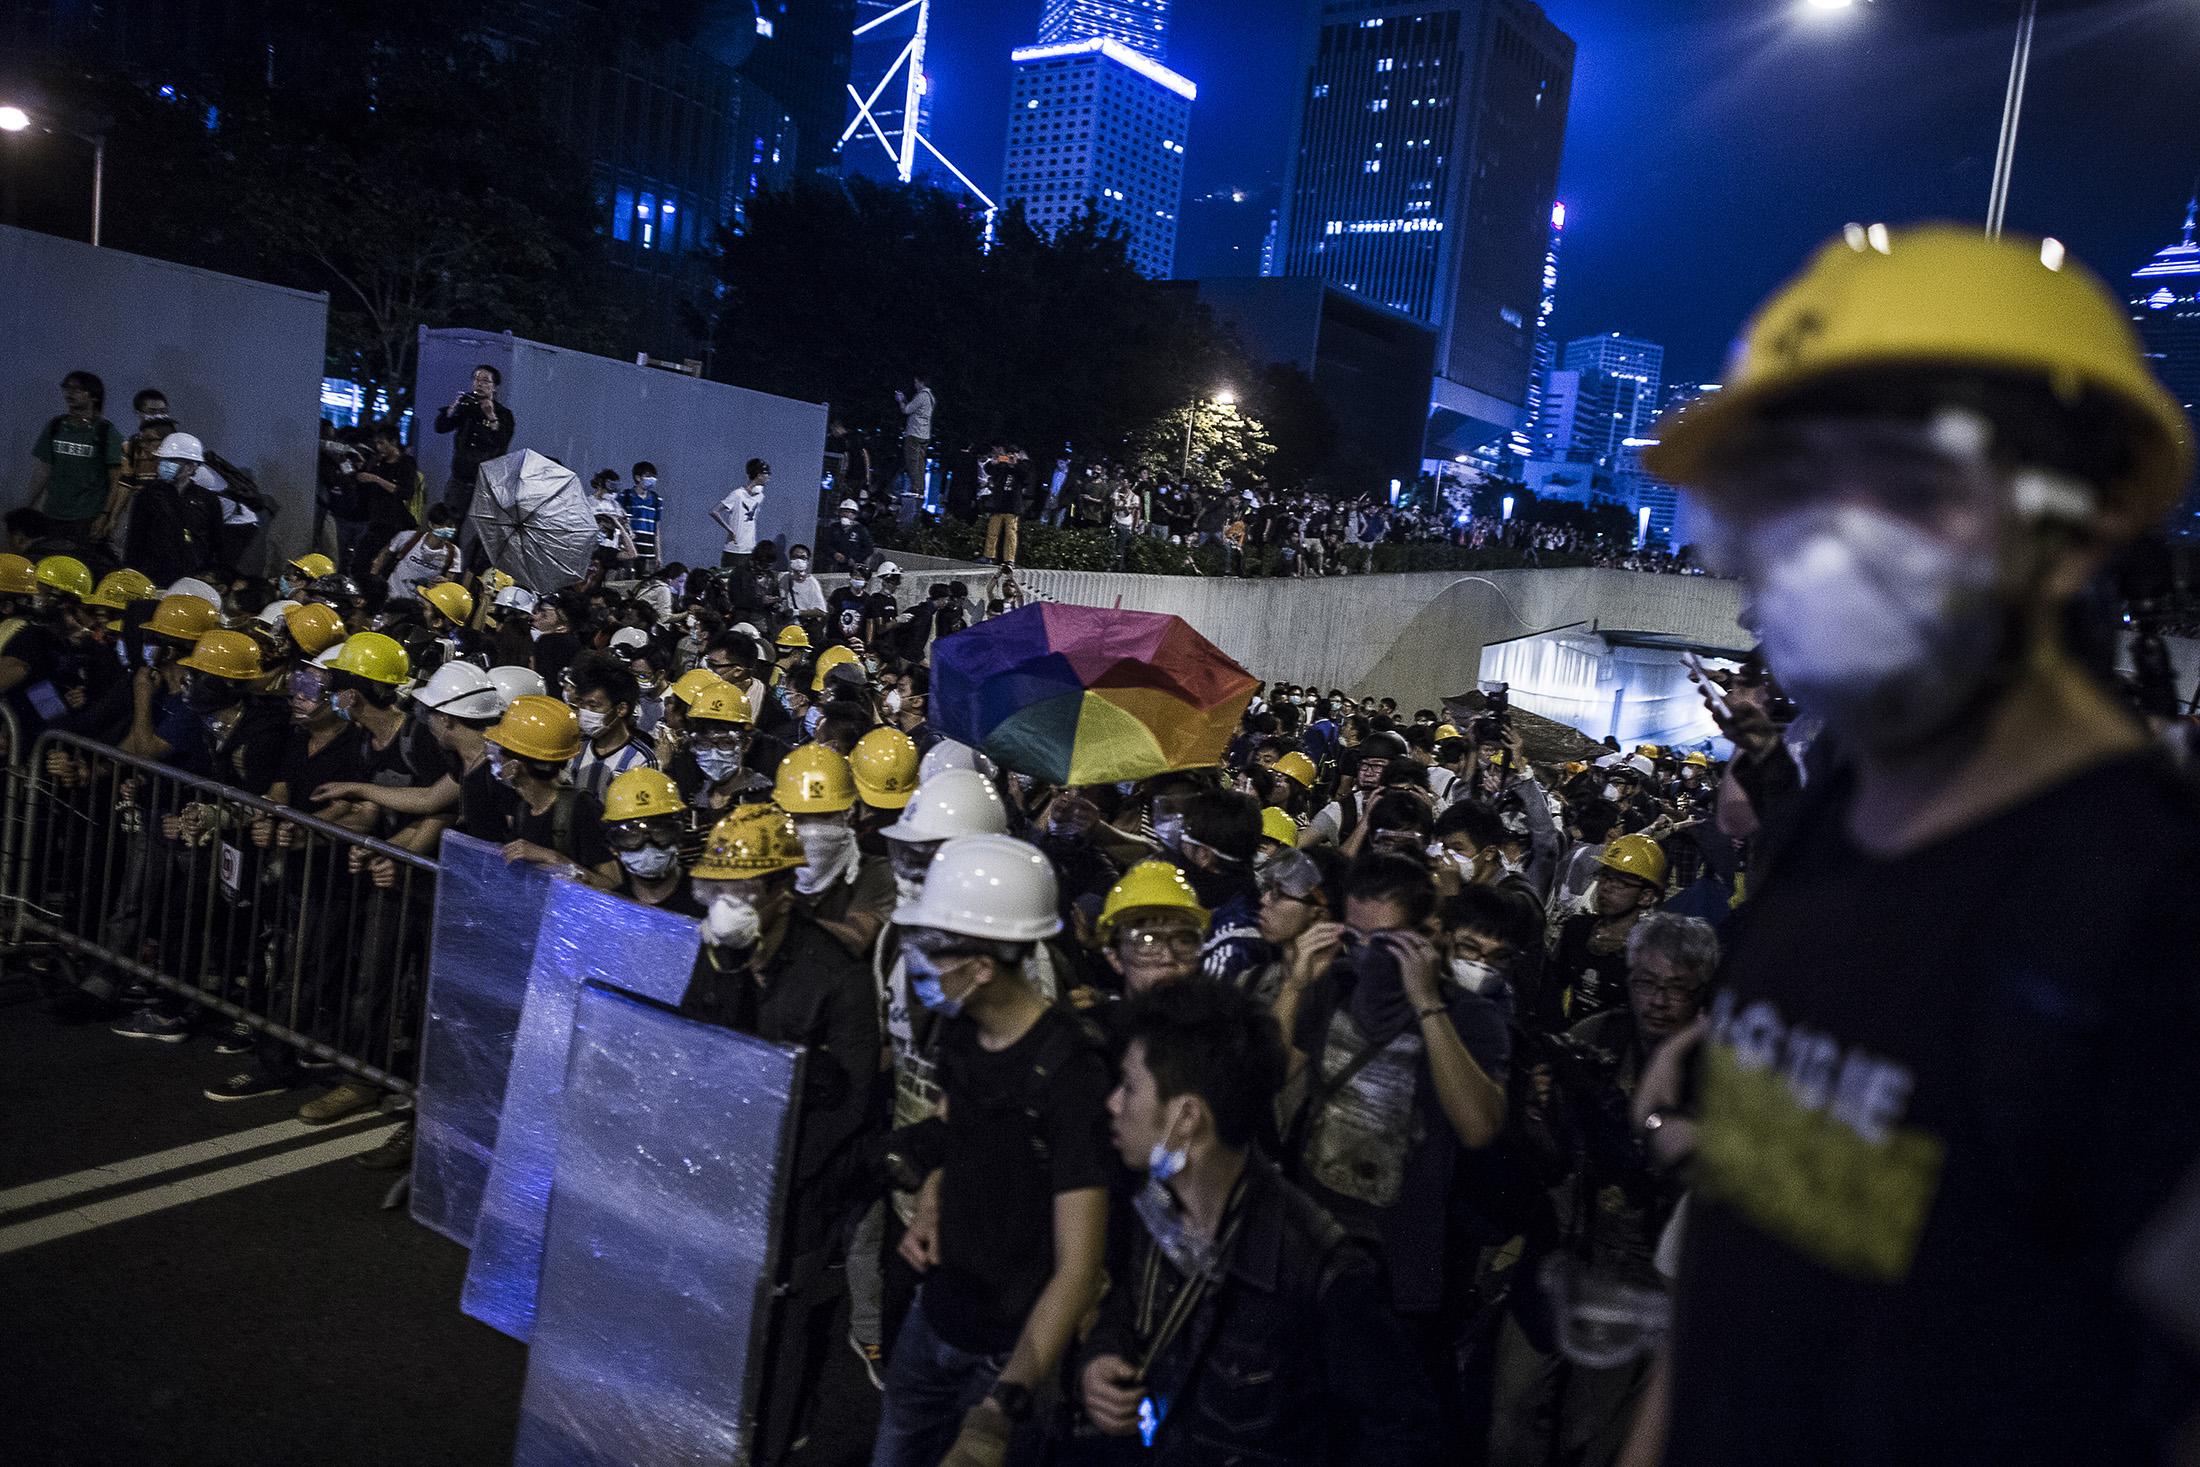 Occupy023.jpg